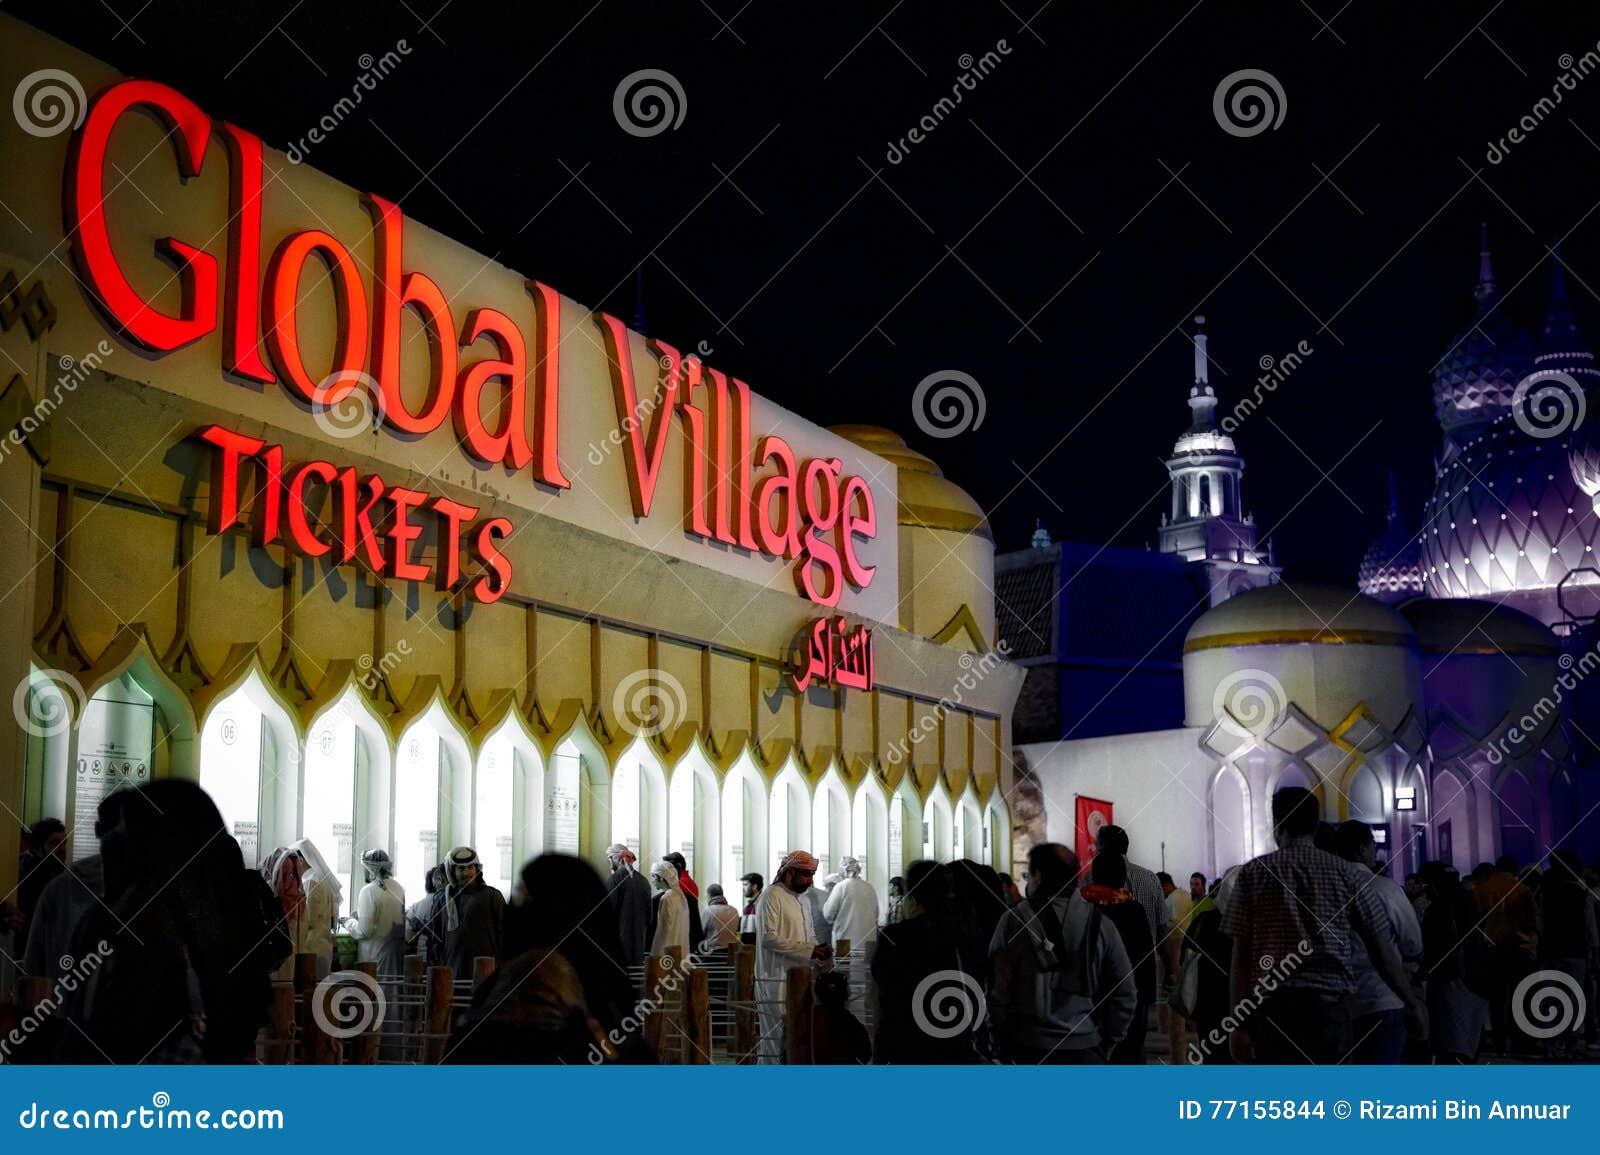 Village global, Dubaï, Emirats Arabes Unis